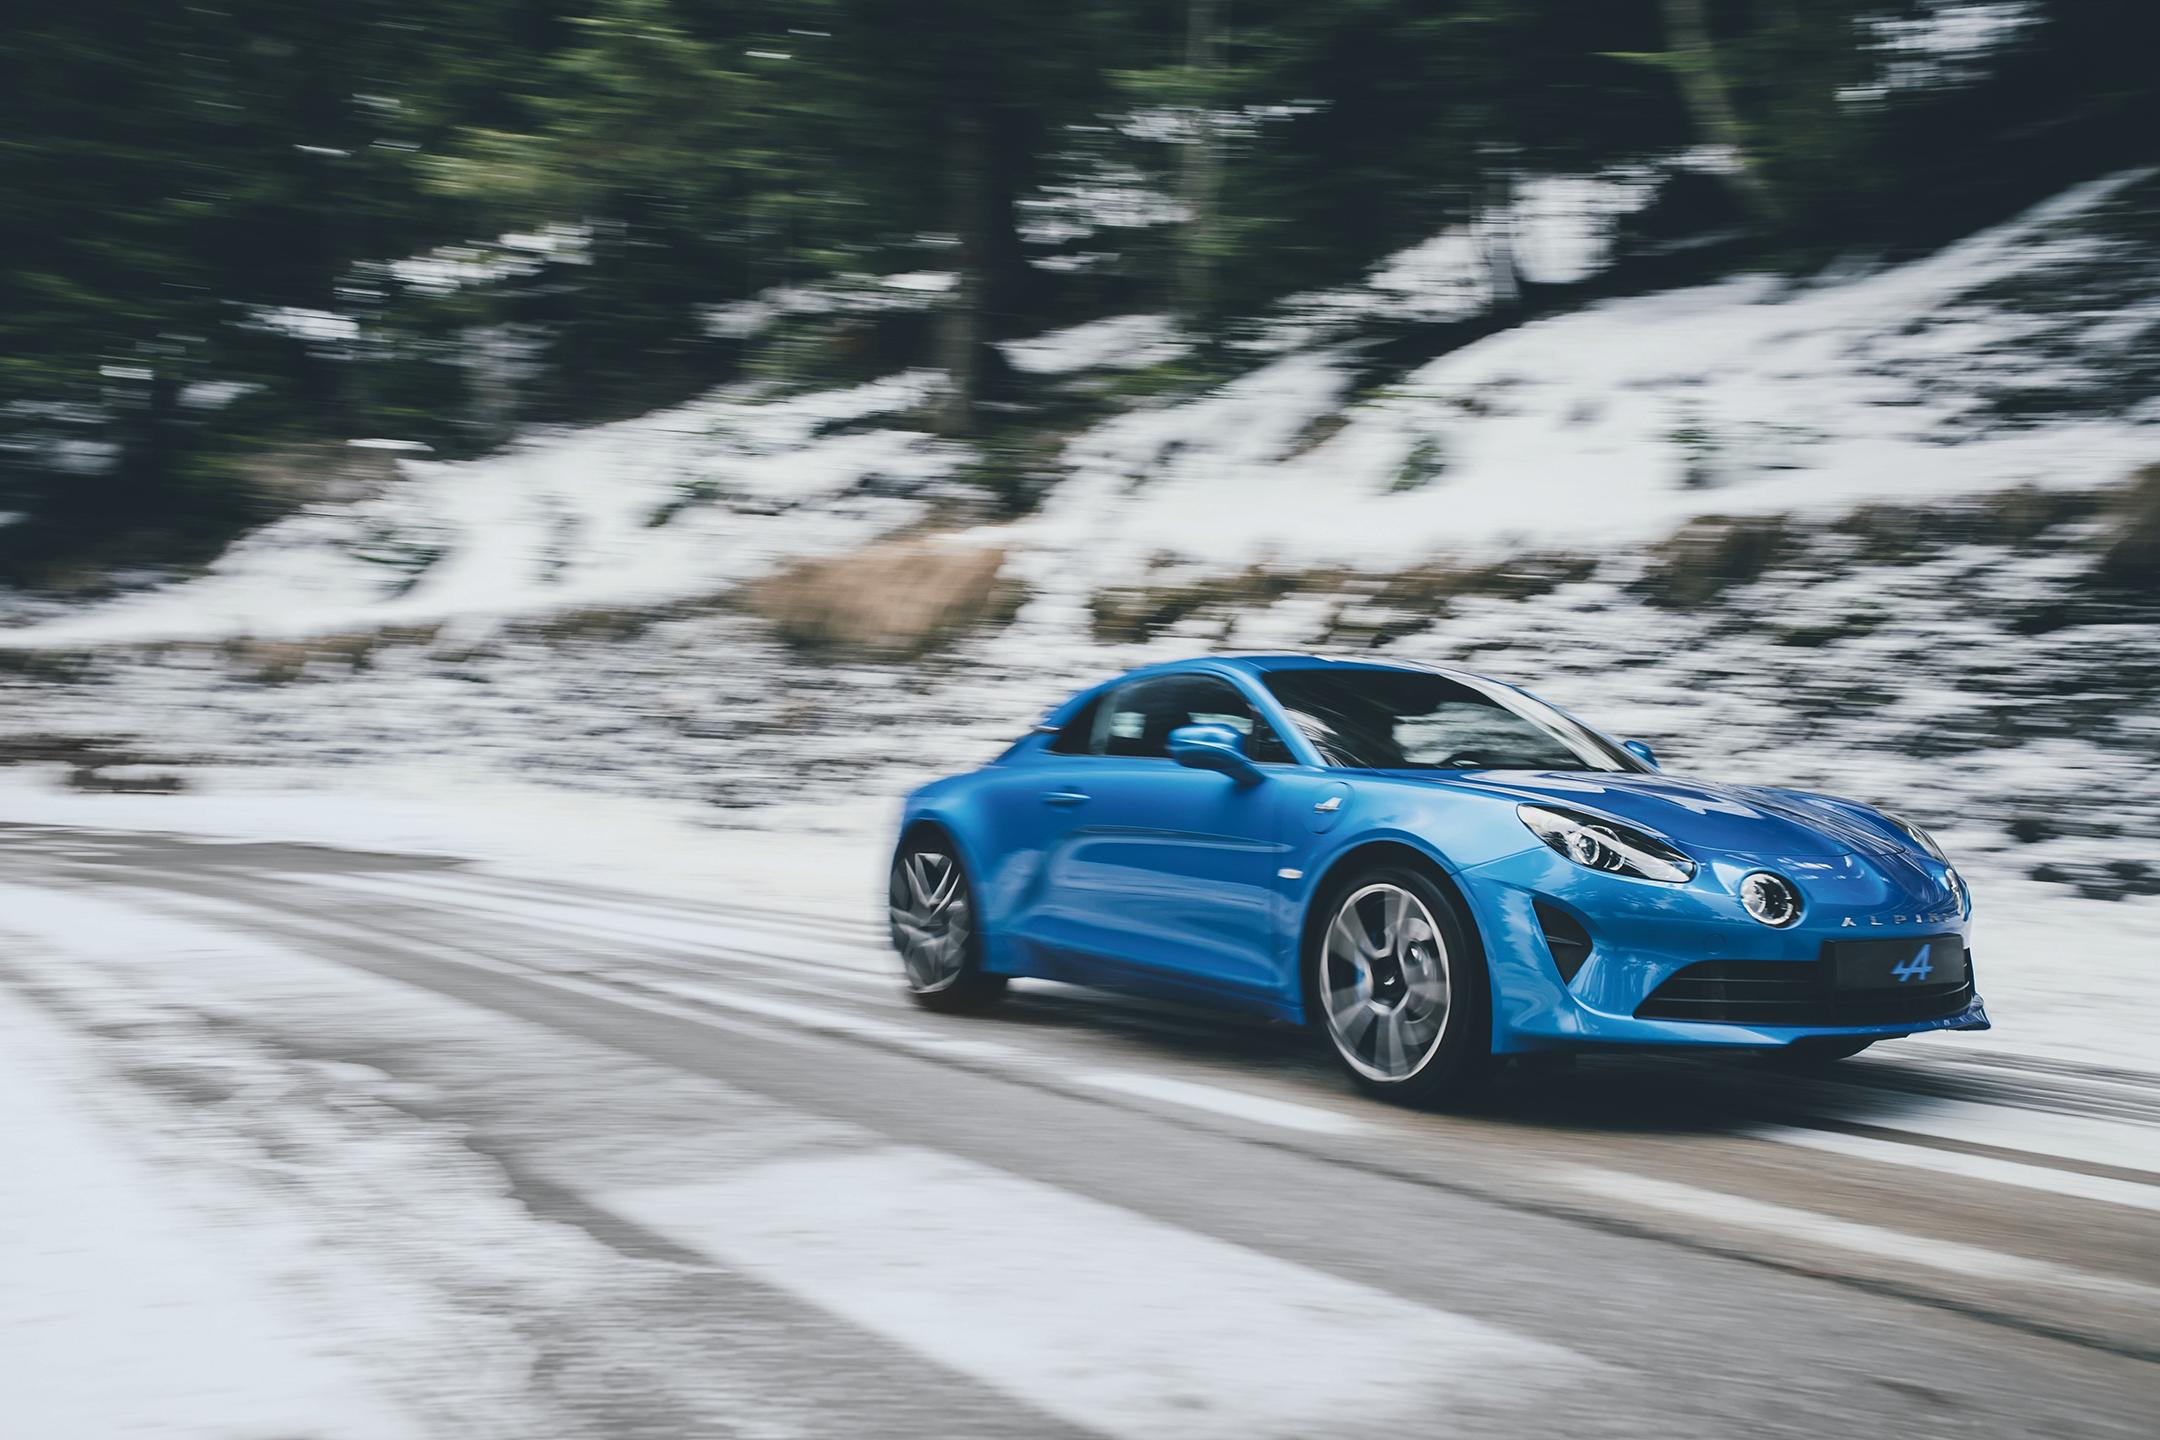 Alpine A110 - 2017 - front - photo Turini